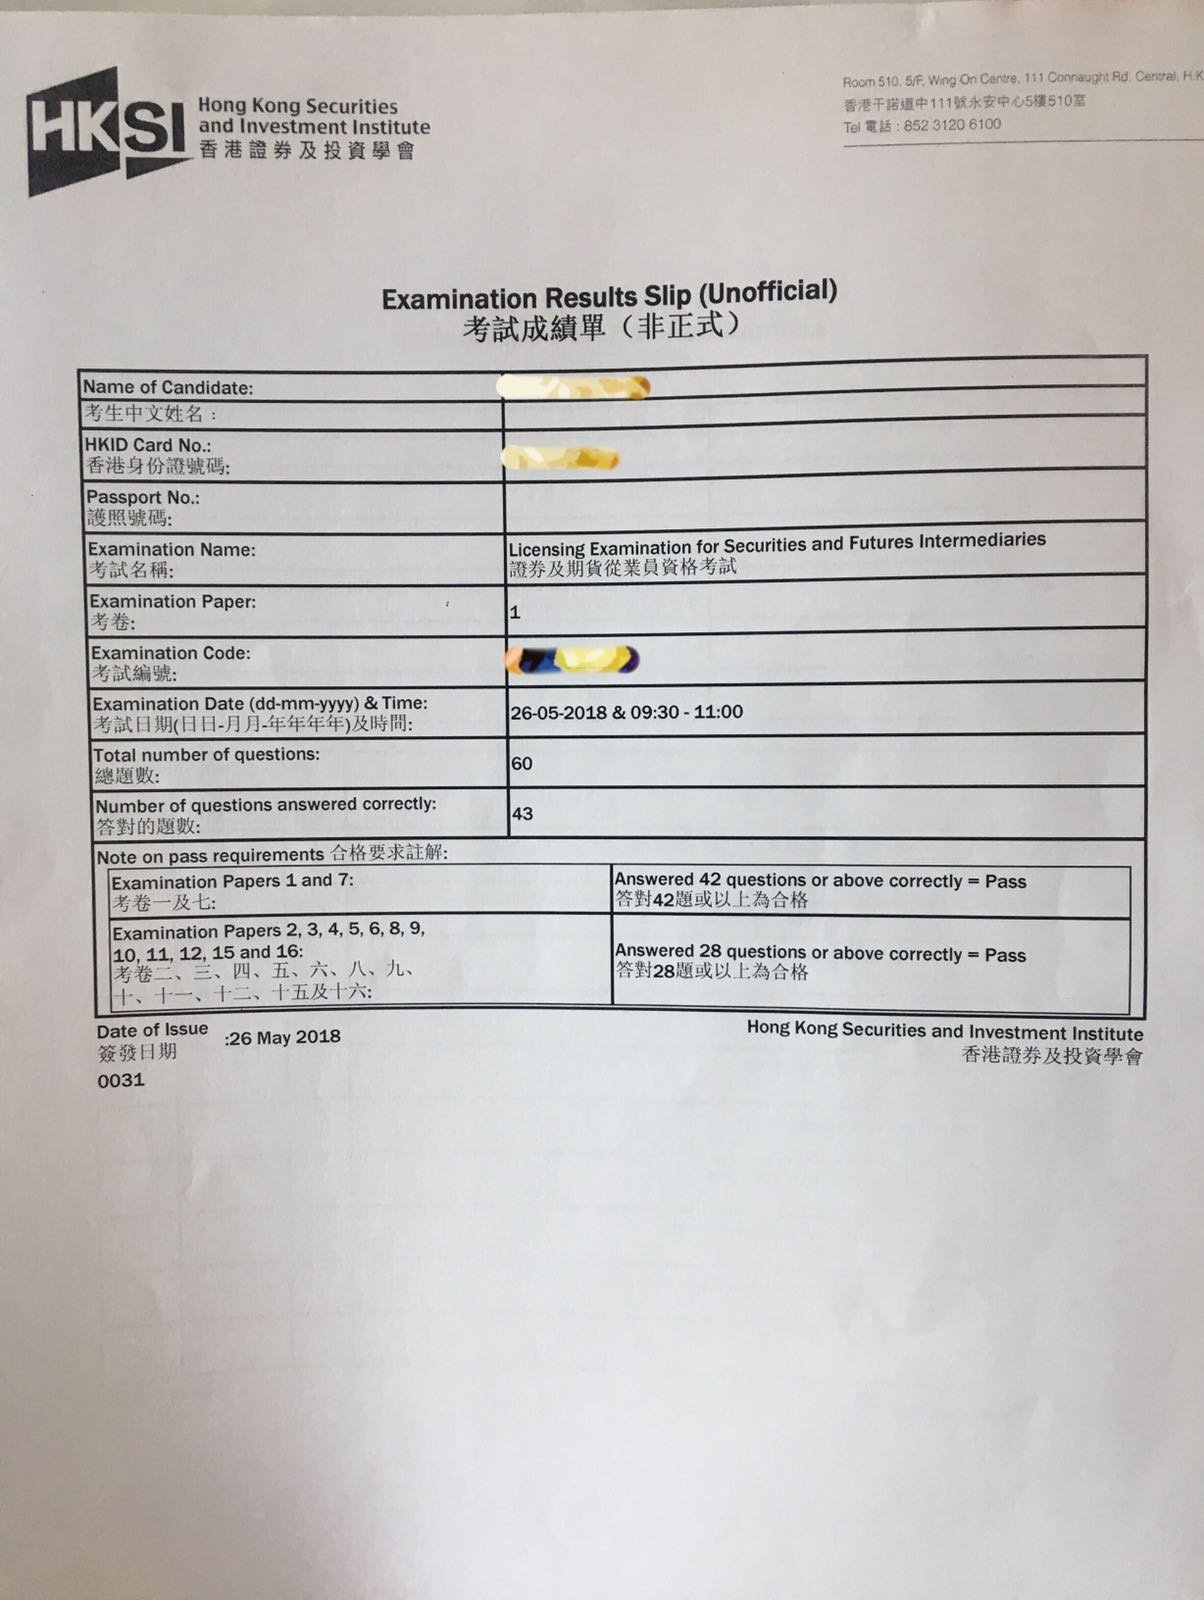 HYL 26/5/2018 LE Paper 1 證券期貨從業員資格考試卷一 Pass